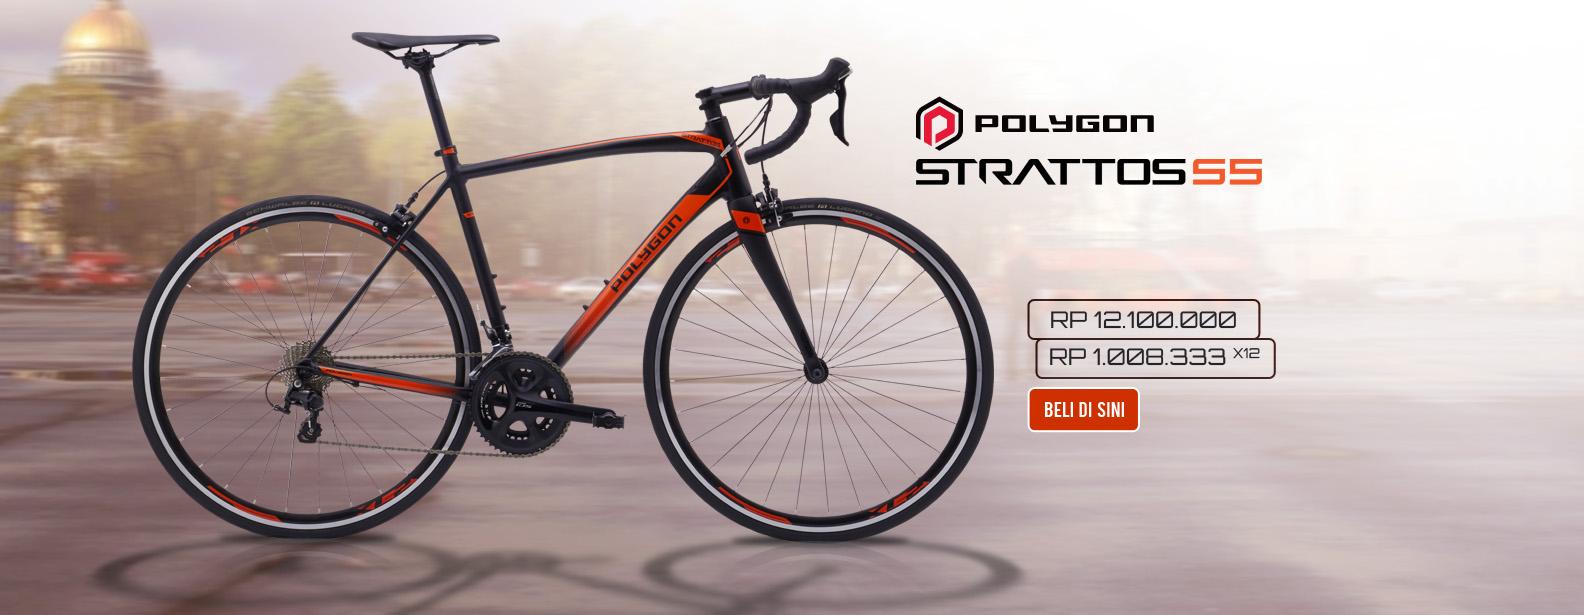 Polygon Sepeda Strattos S5